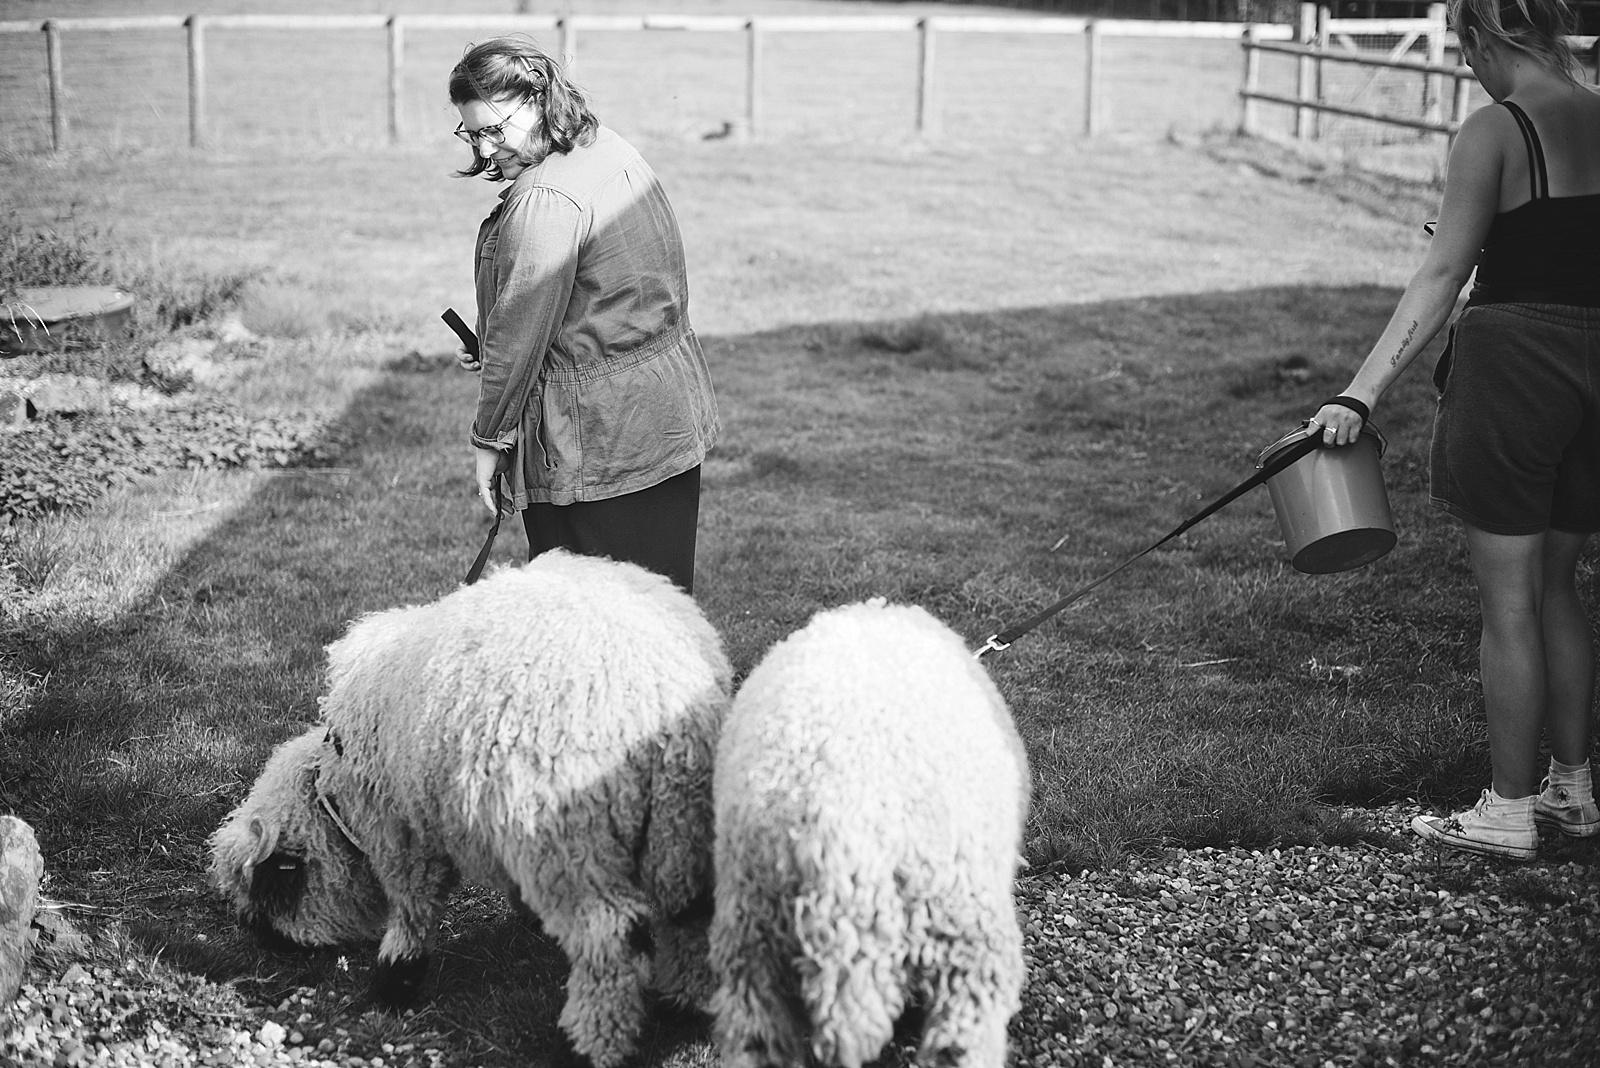 Valais Blacknose Sheep Walk and Cuddle at The Sunshine Farm in Northampton England